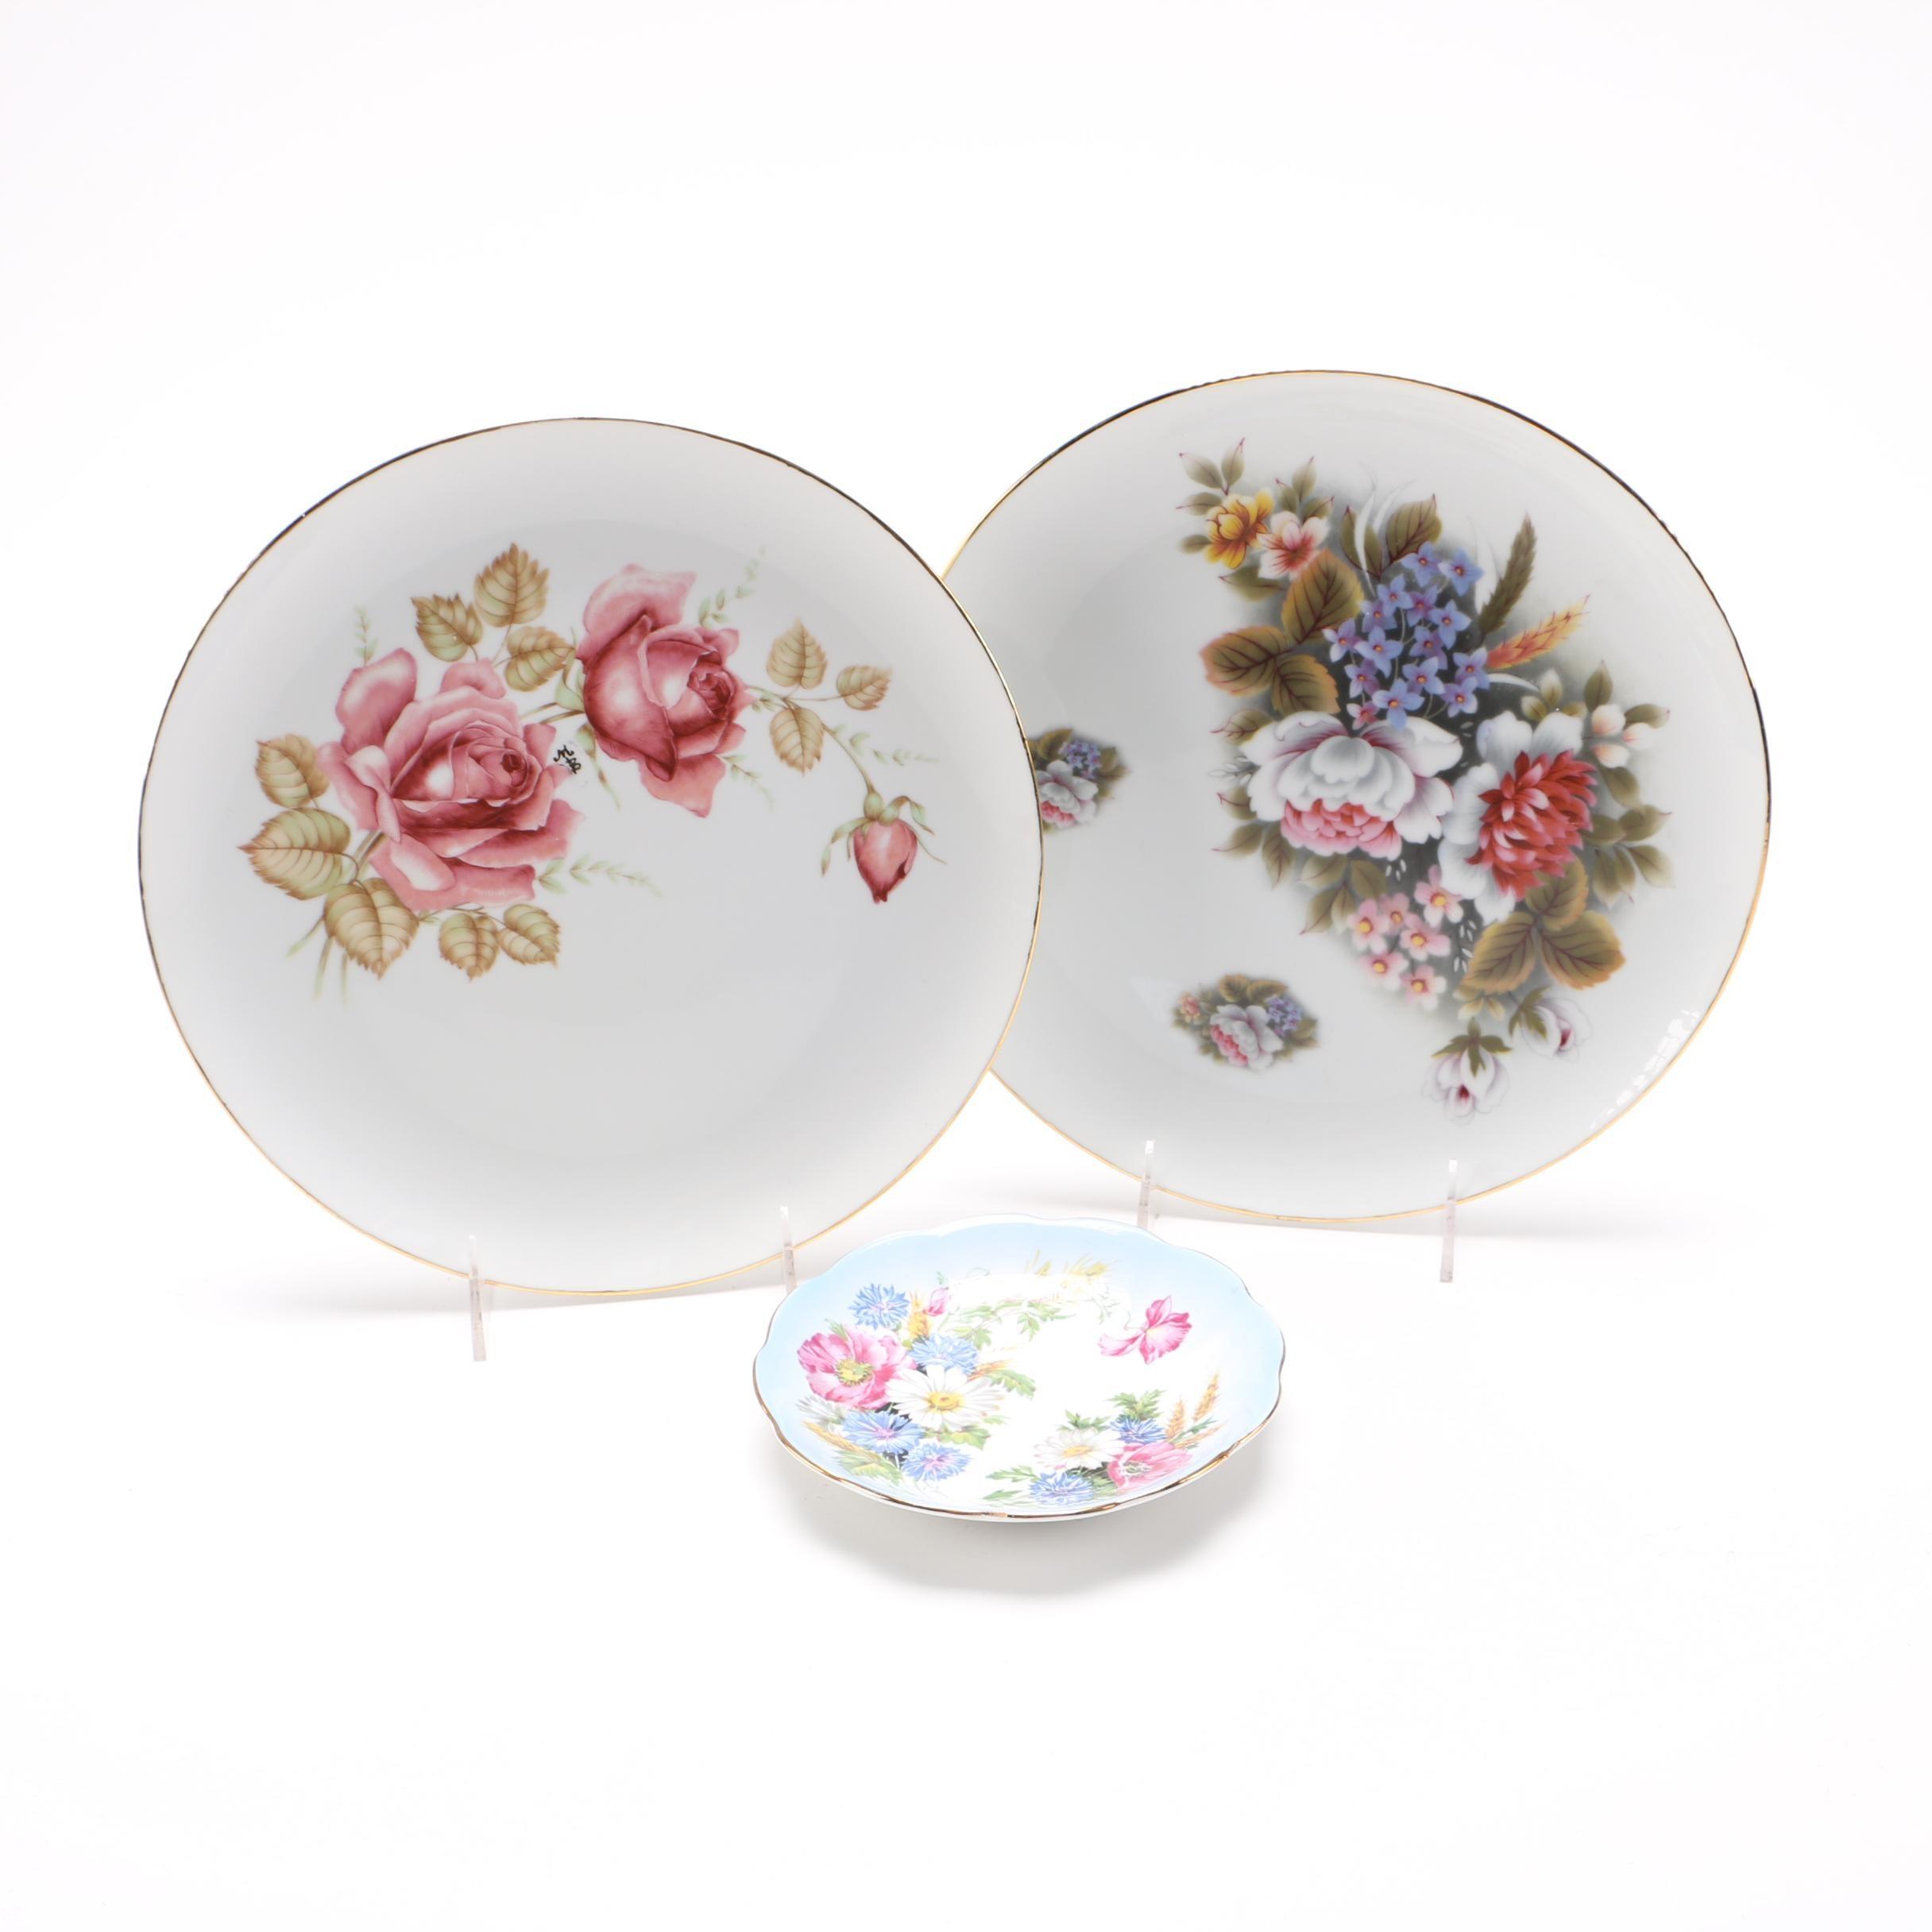 Floral Porcelain Plates and Bowl